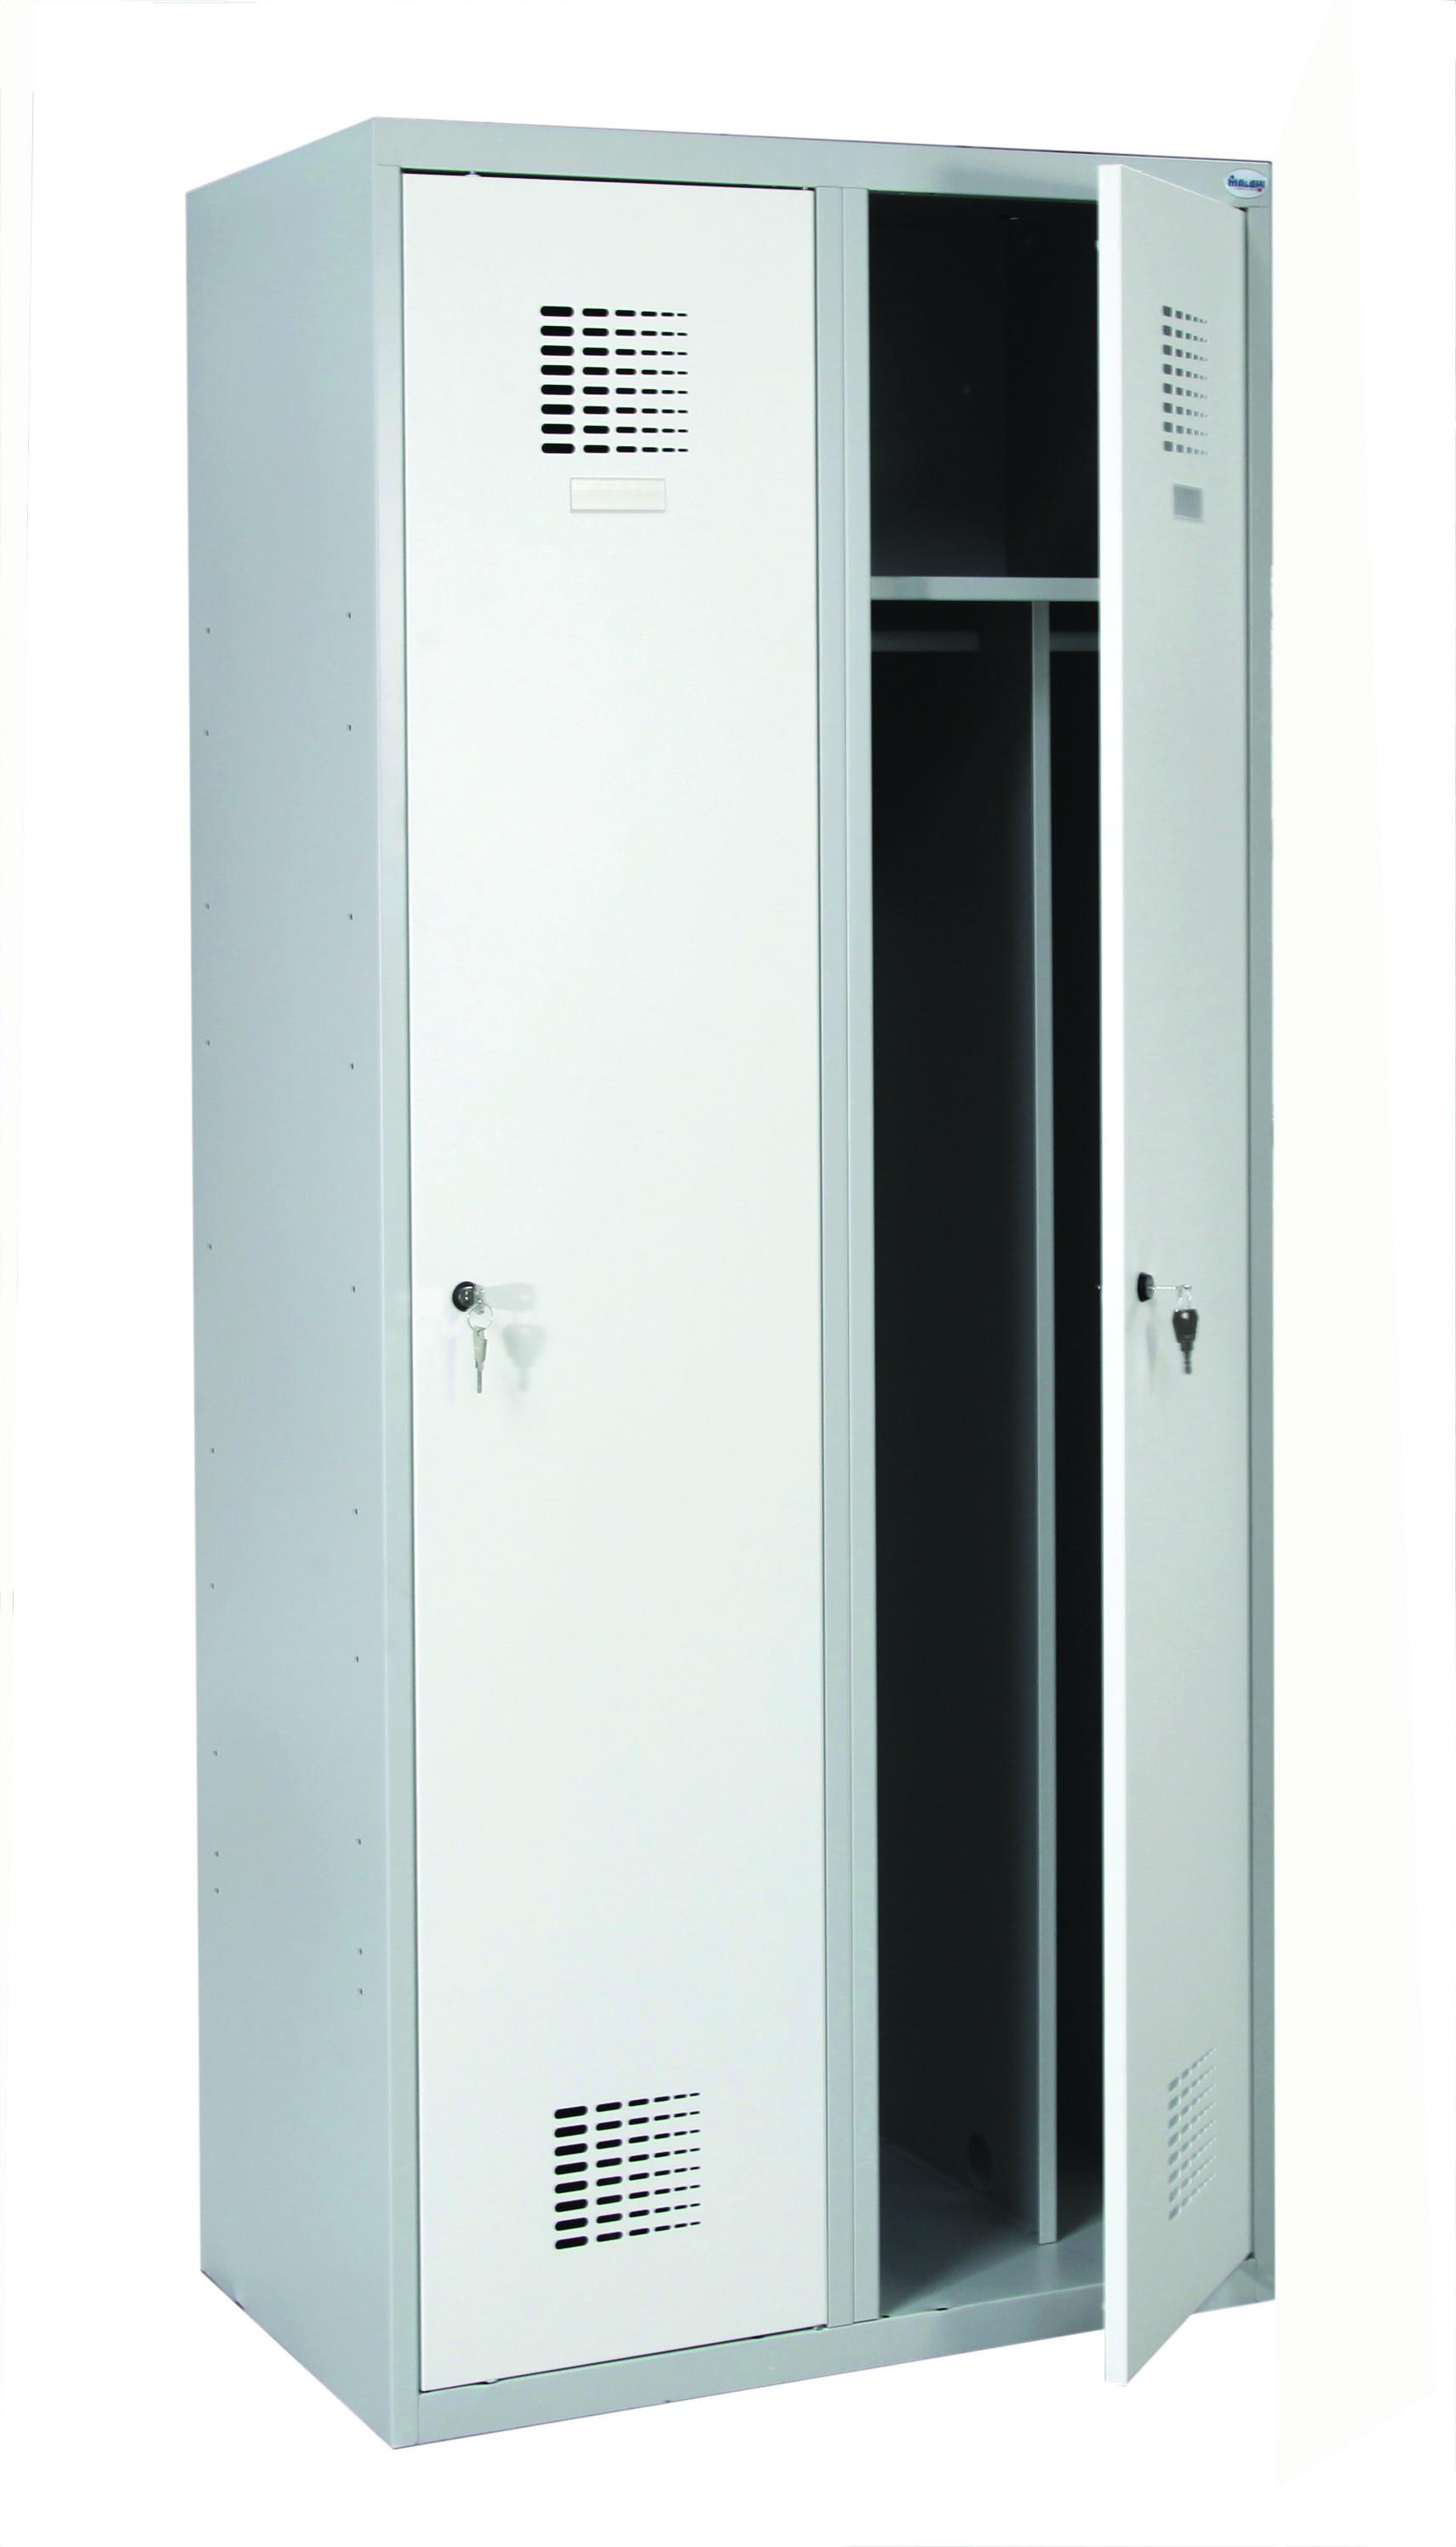 Vestiaire IP CVS412DSP 2 cases AKAZE 800x500x1800 mm - CVS412DSP